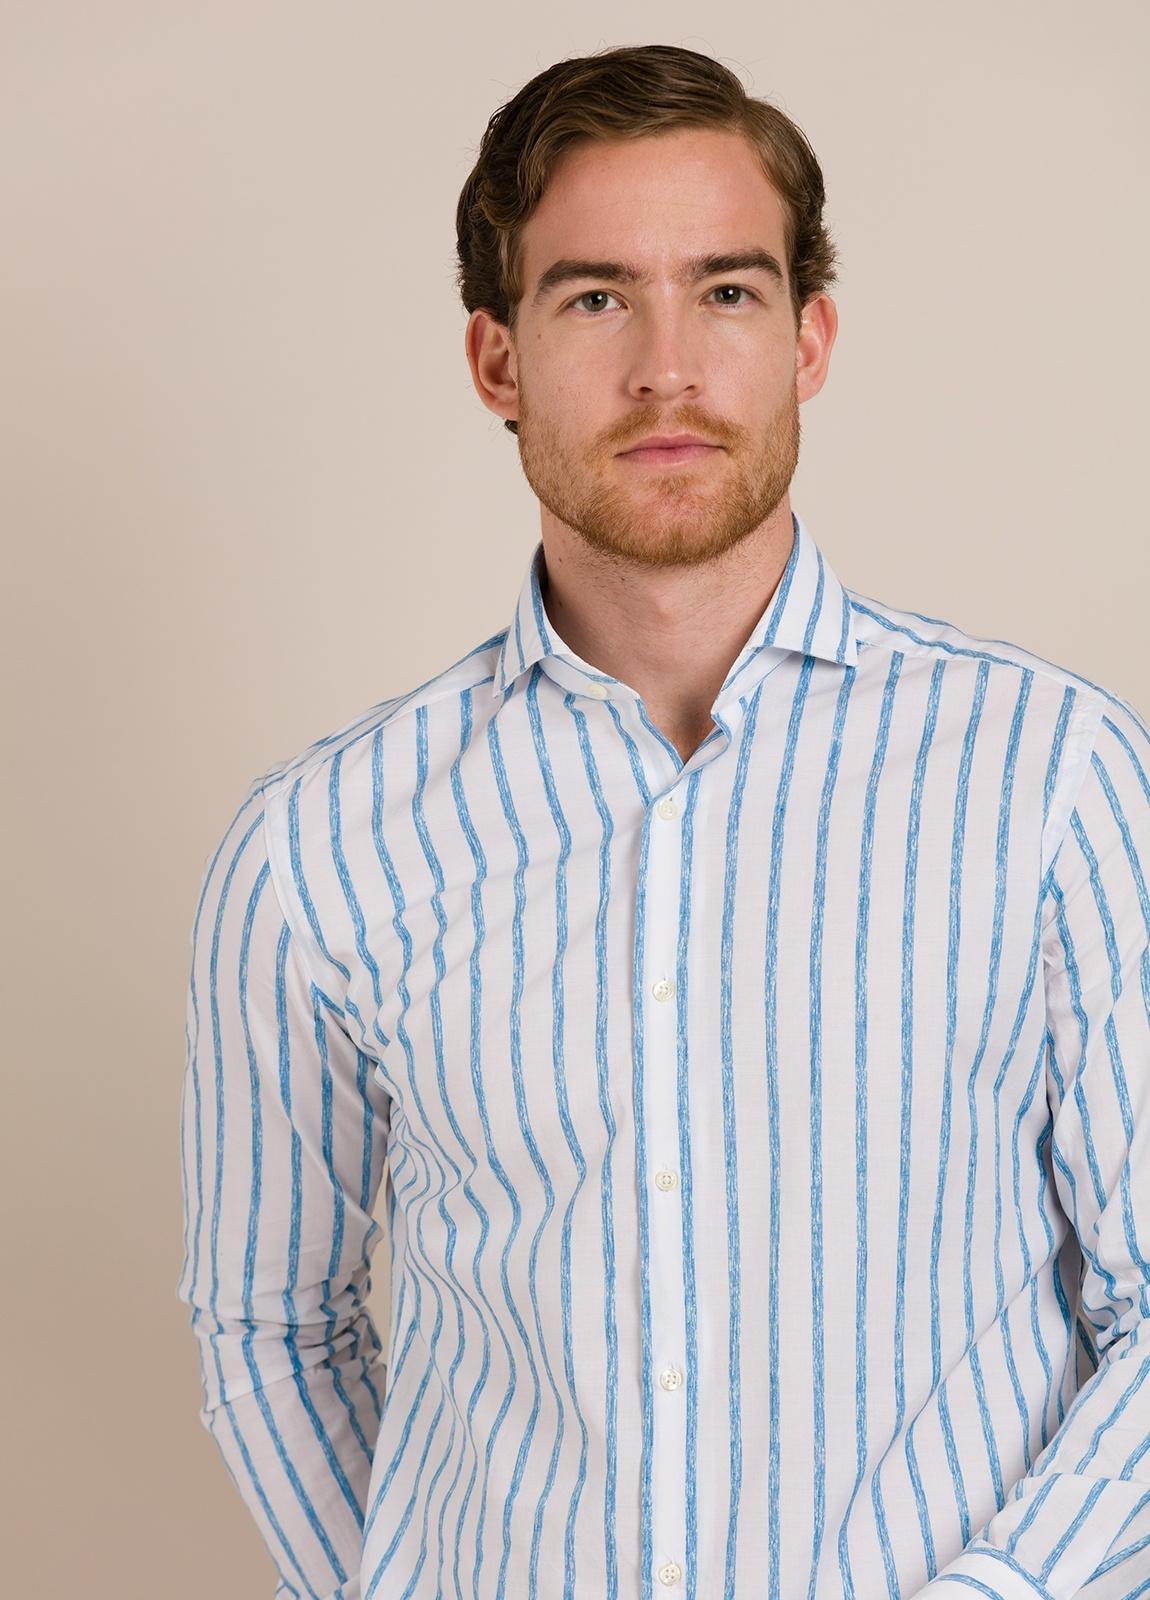 Camisa sport FUREST COLECCIÓN SLIM FIT rayas azul - Ítem5